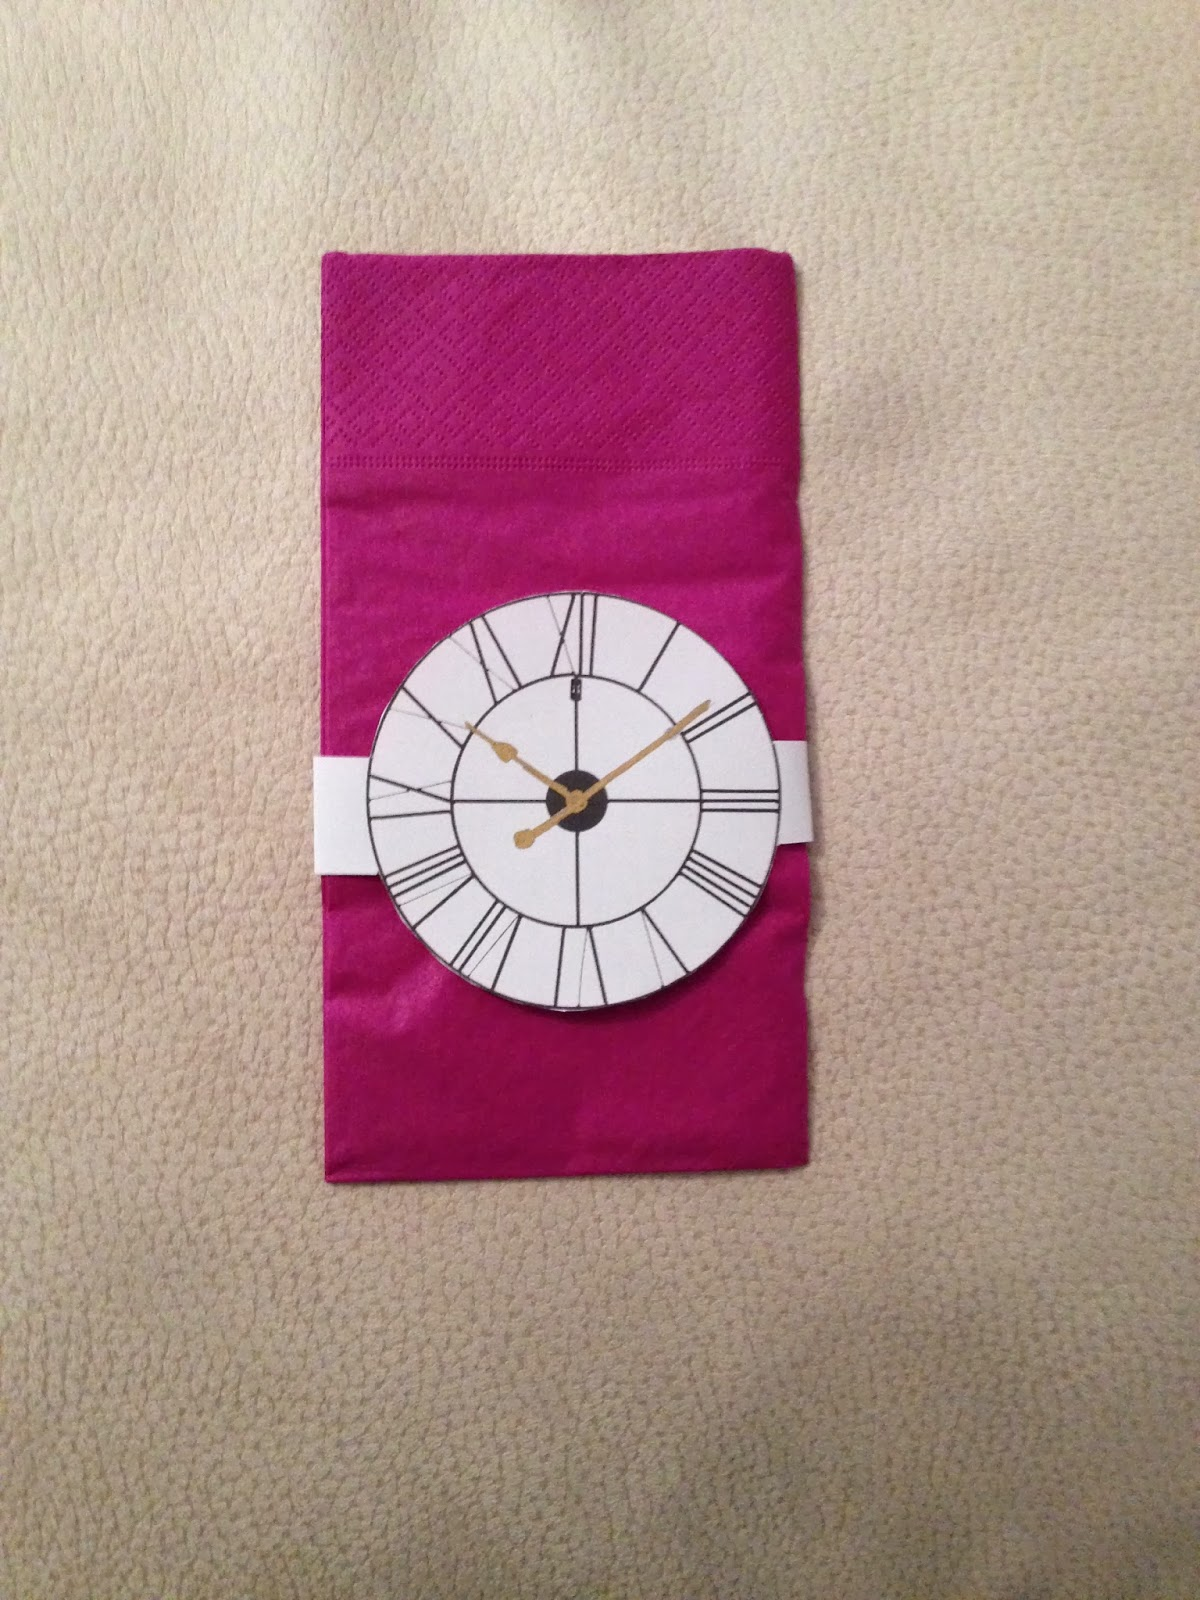 Ideas para una decoraci n de nochevieja fin de a o manualidades amelia - Decoracion relojes de pared ...